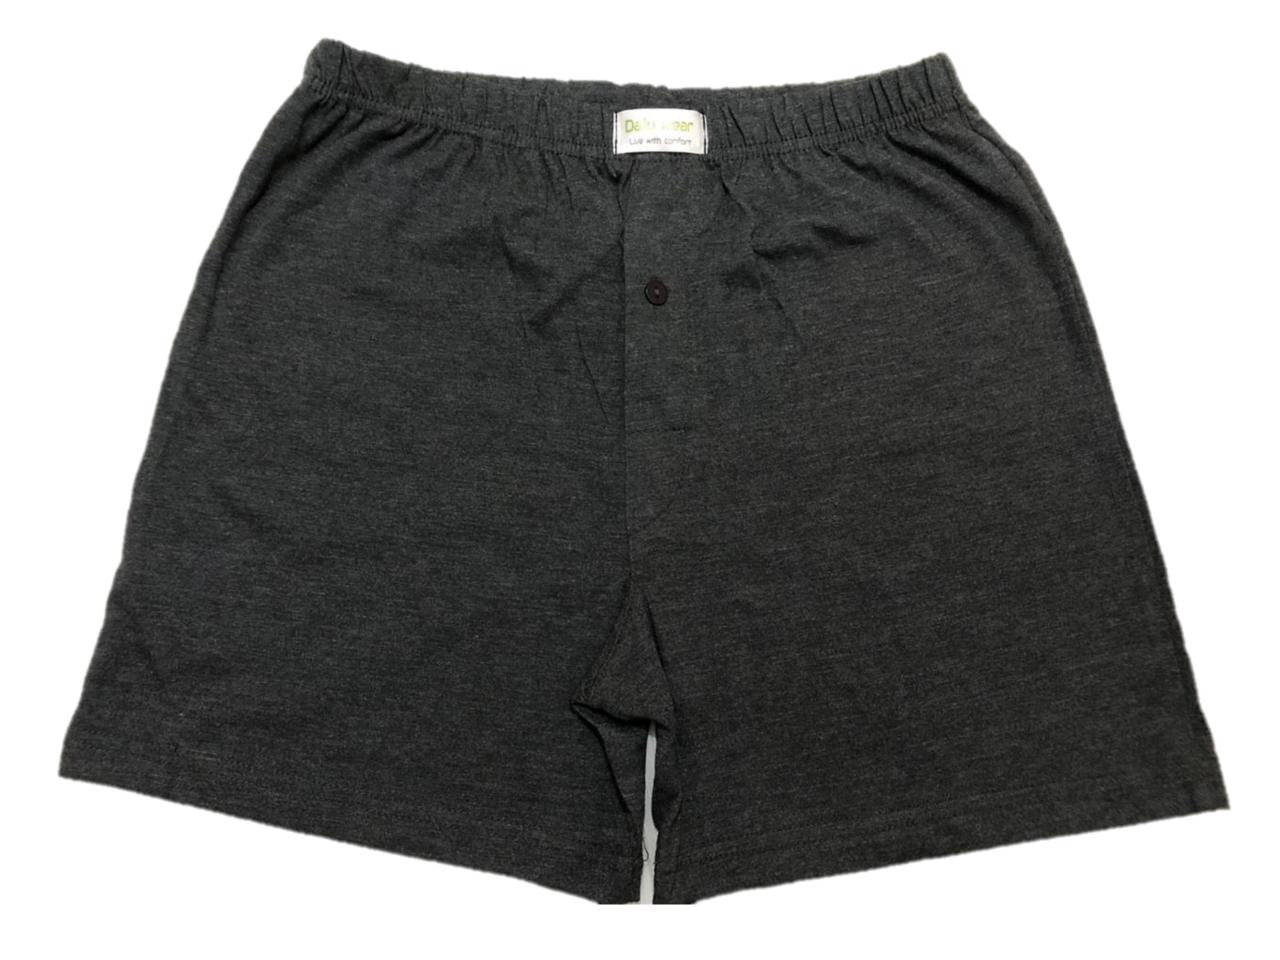 Daily Wear premium undergarment boxer shorts for men